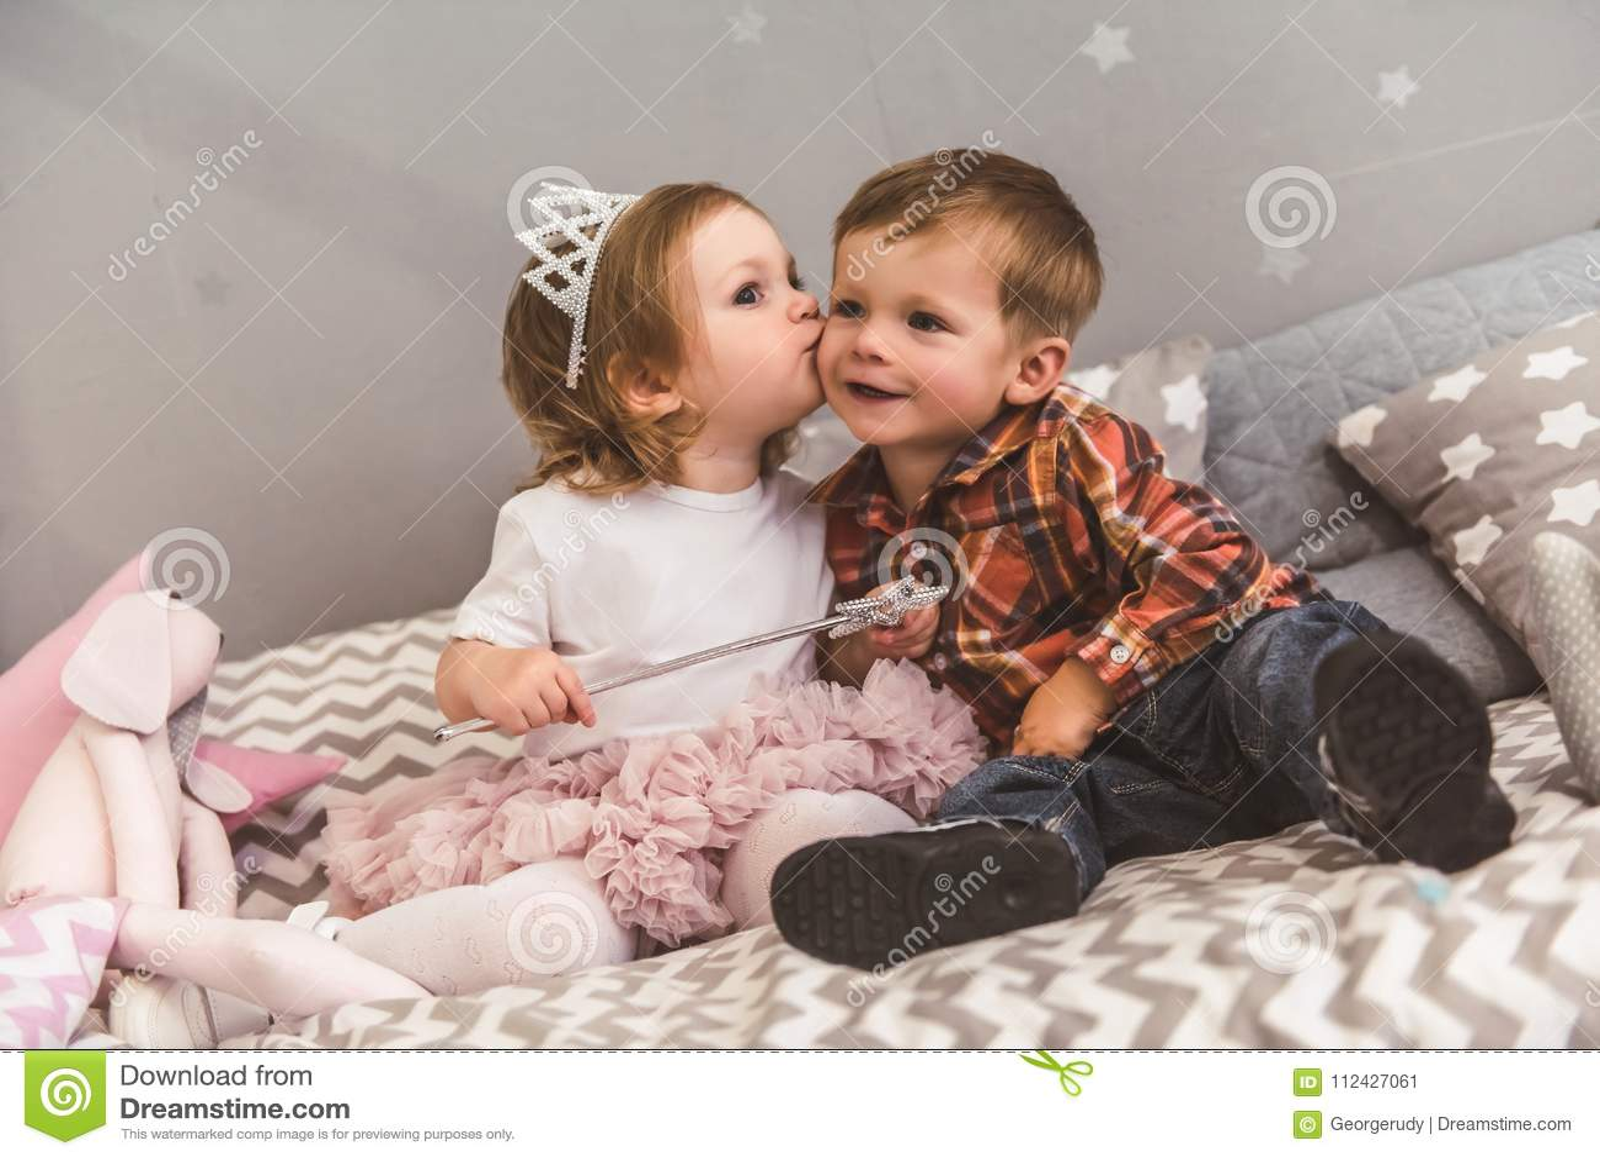 Дети: милые пары